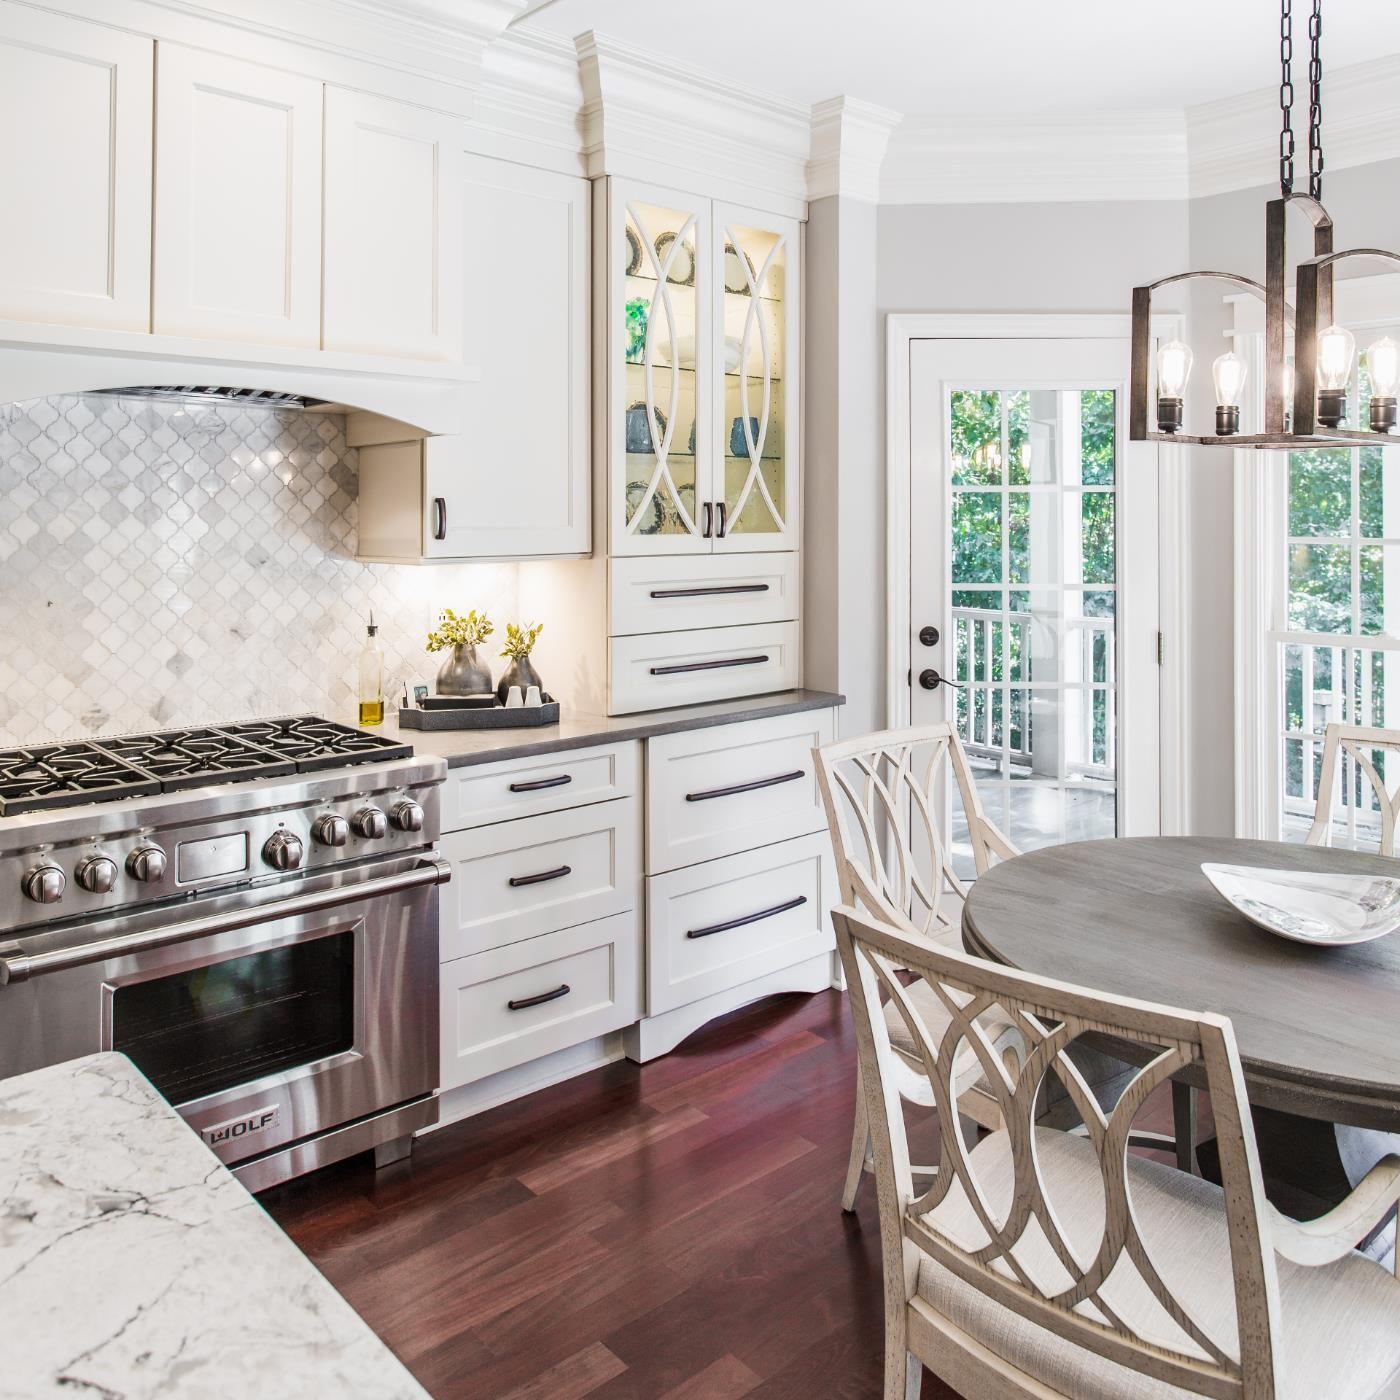 Cape Cod Kitchen Prosource Wholesale Cape Cod Kitchen Cabinets And Countertops Kitchen Remodel